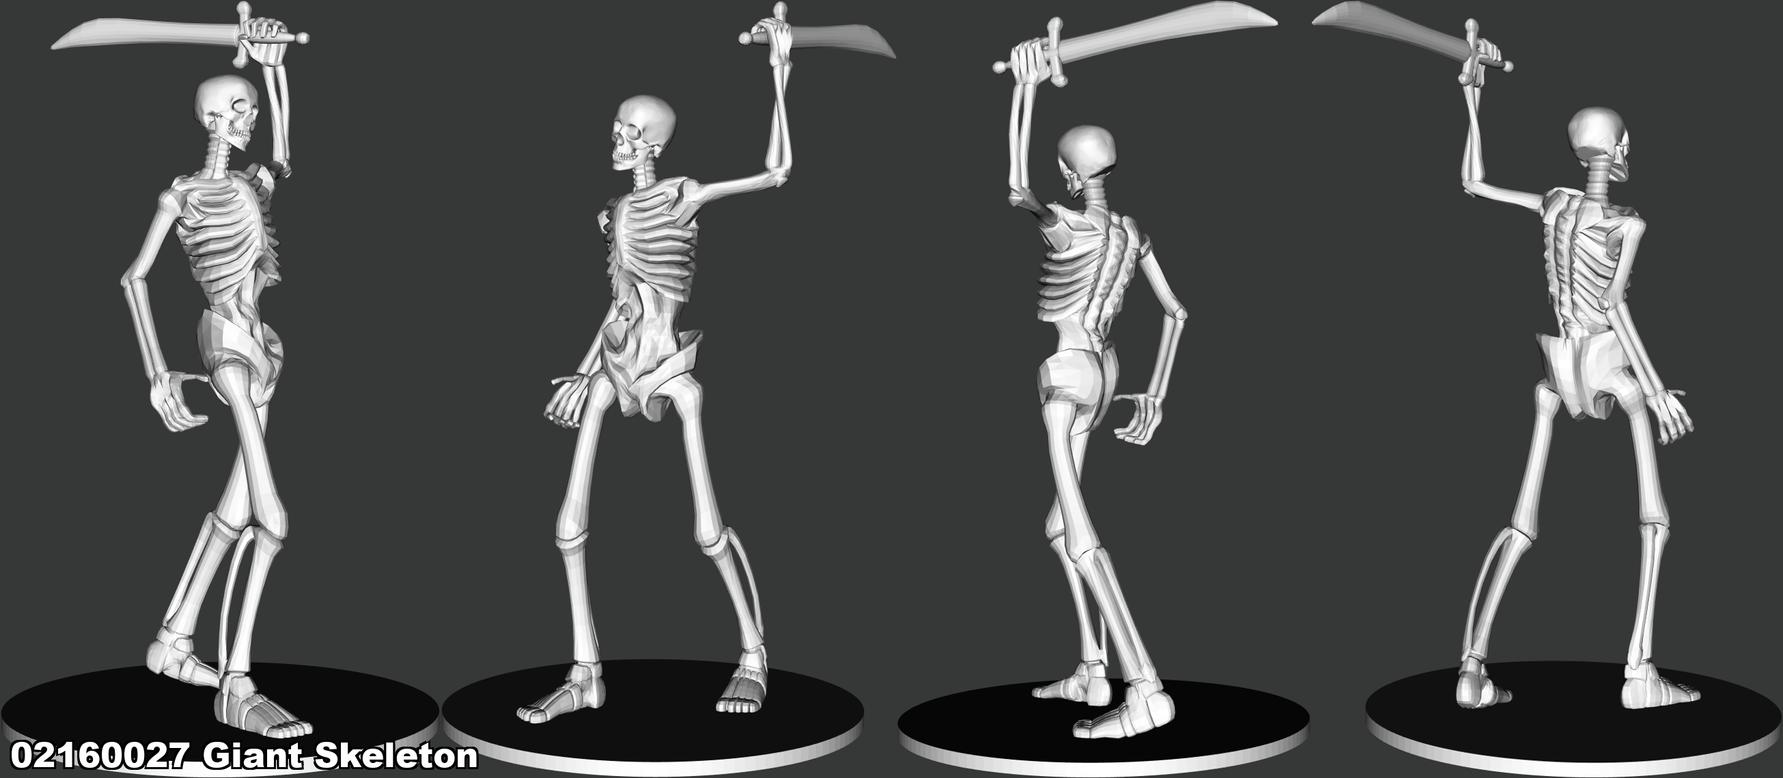 02160027 Giant Skeleton.png